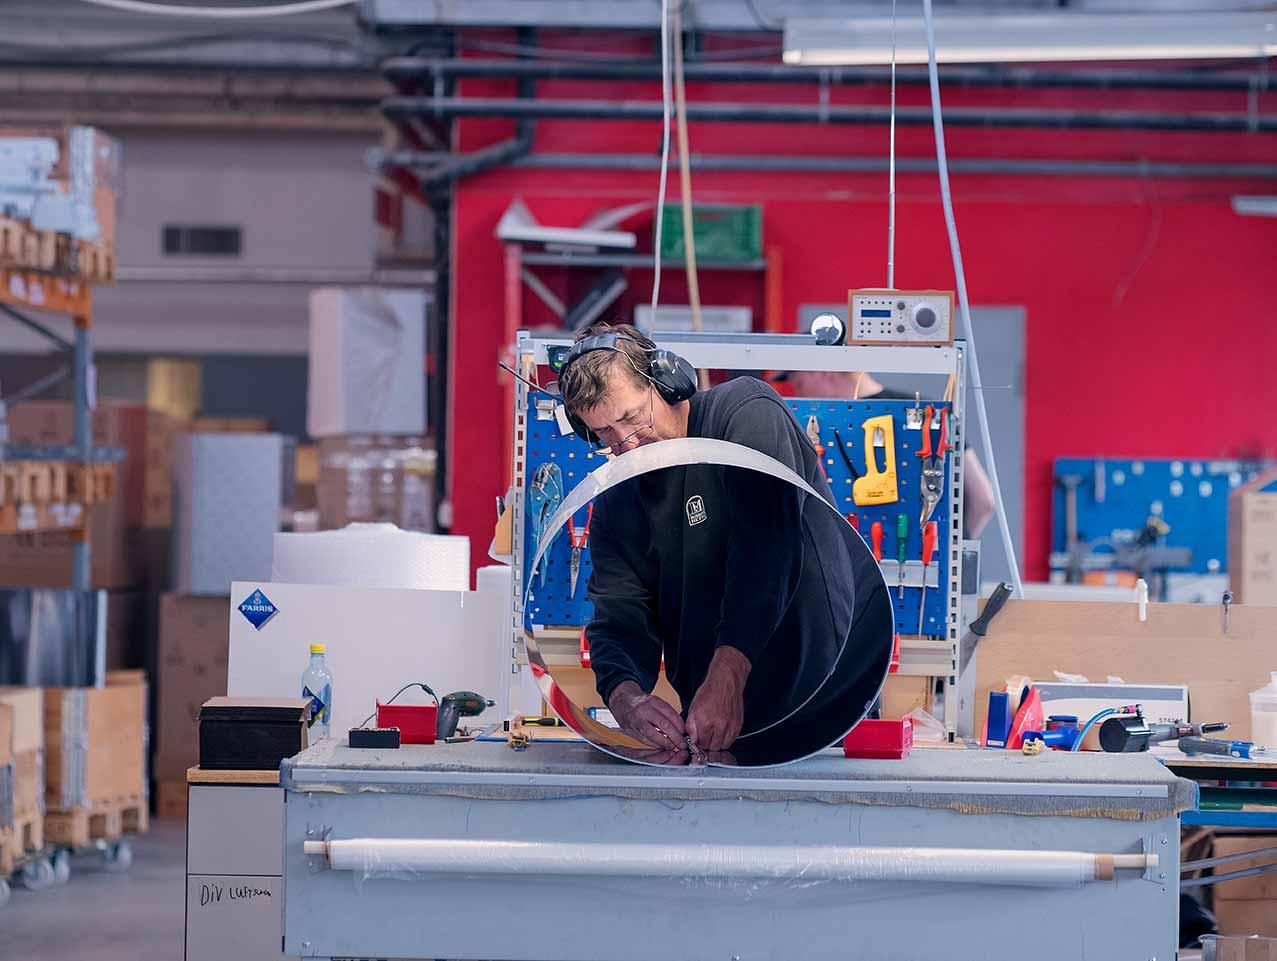 worker at roroshetta factory bending metal sheets